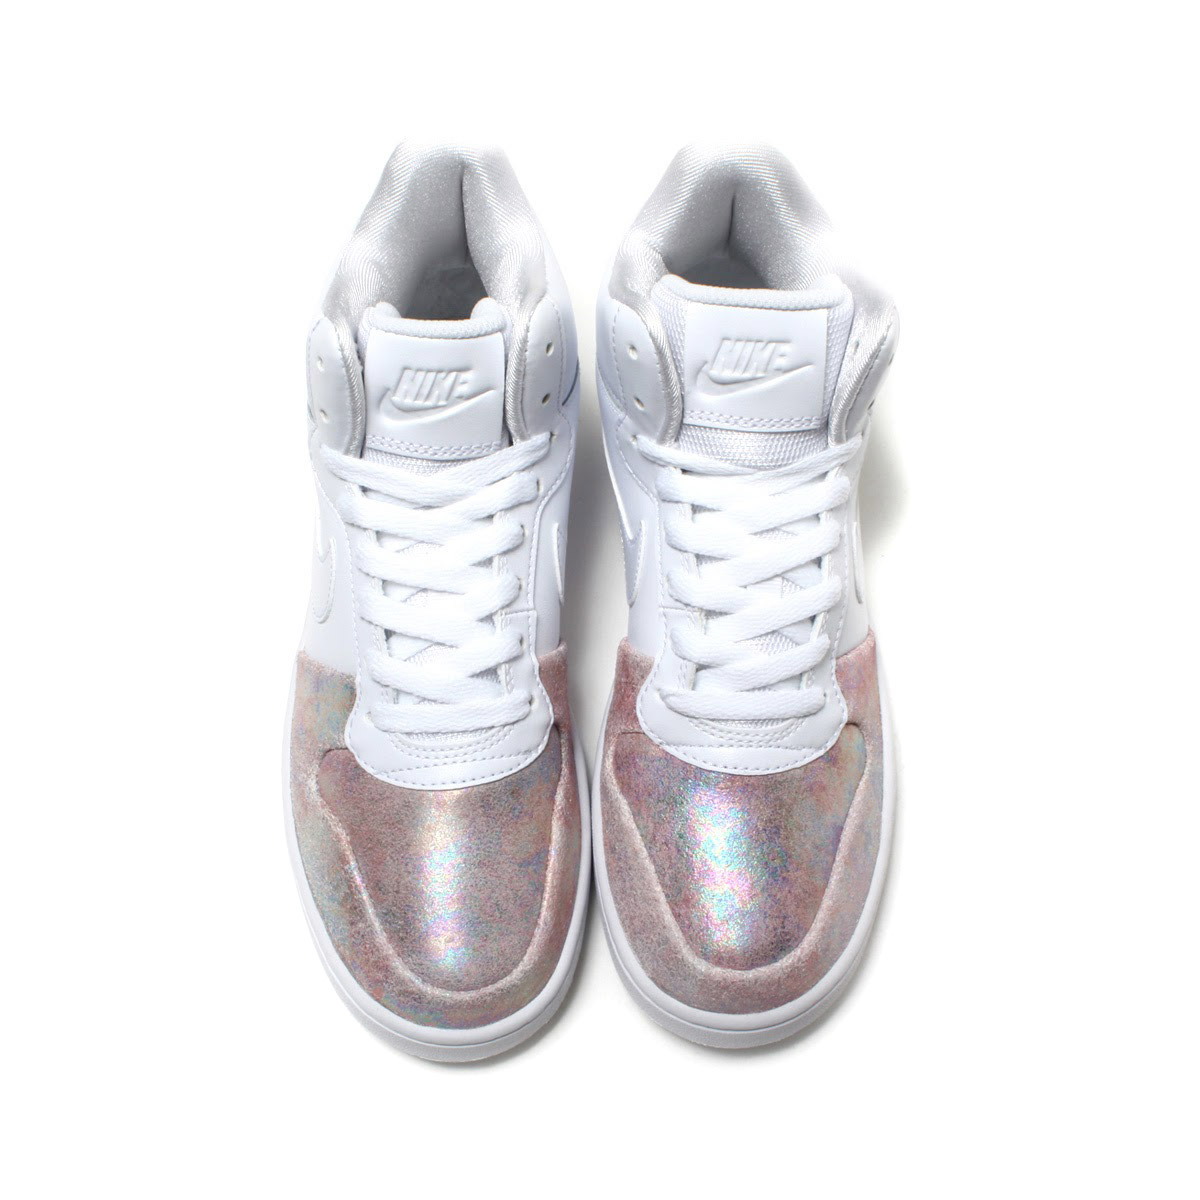 fbe07326107d NIKE W COURT BOROUGH MID PREM (Nike women coat Barlow mid premium)  WHITE WHITE-ROSE GOLD 17HO-I